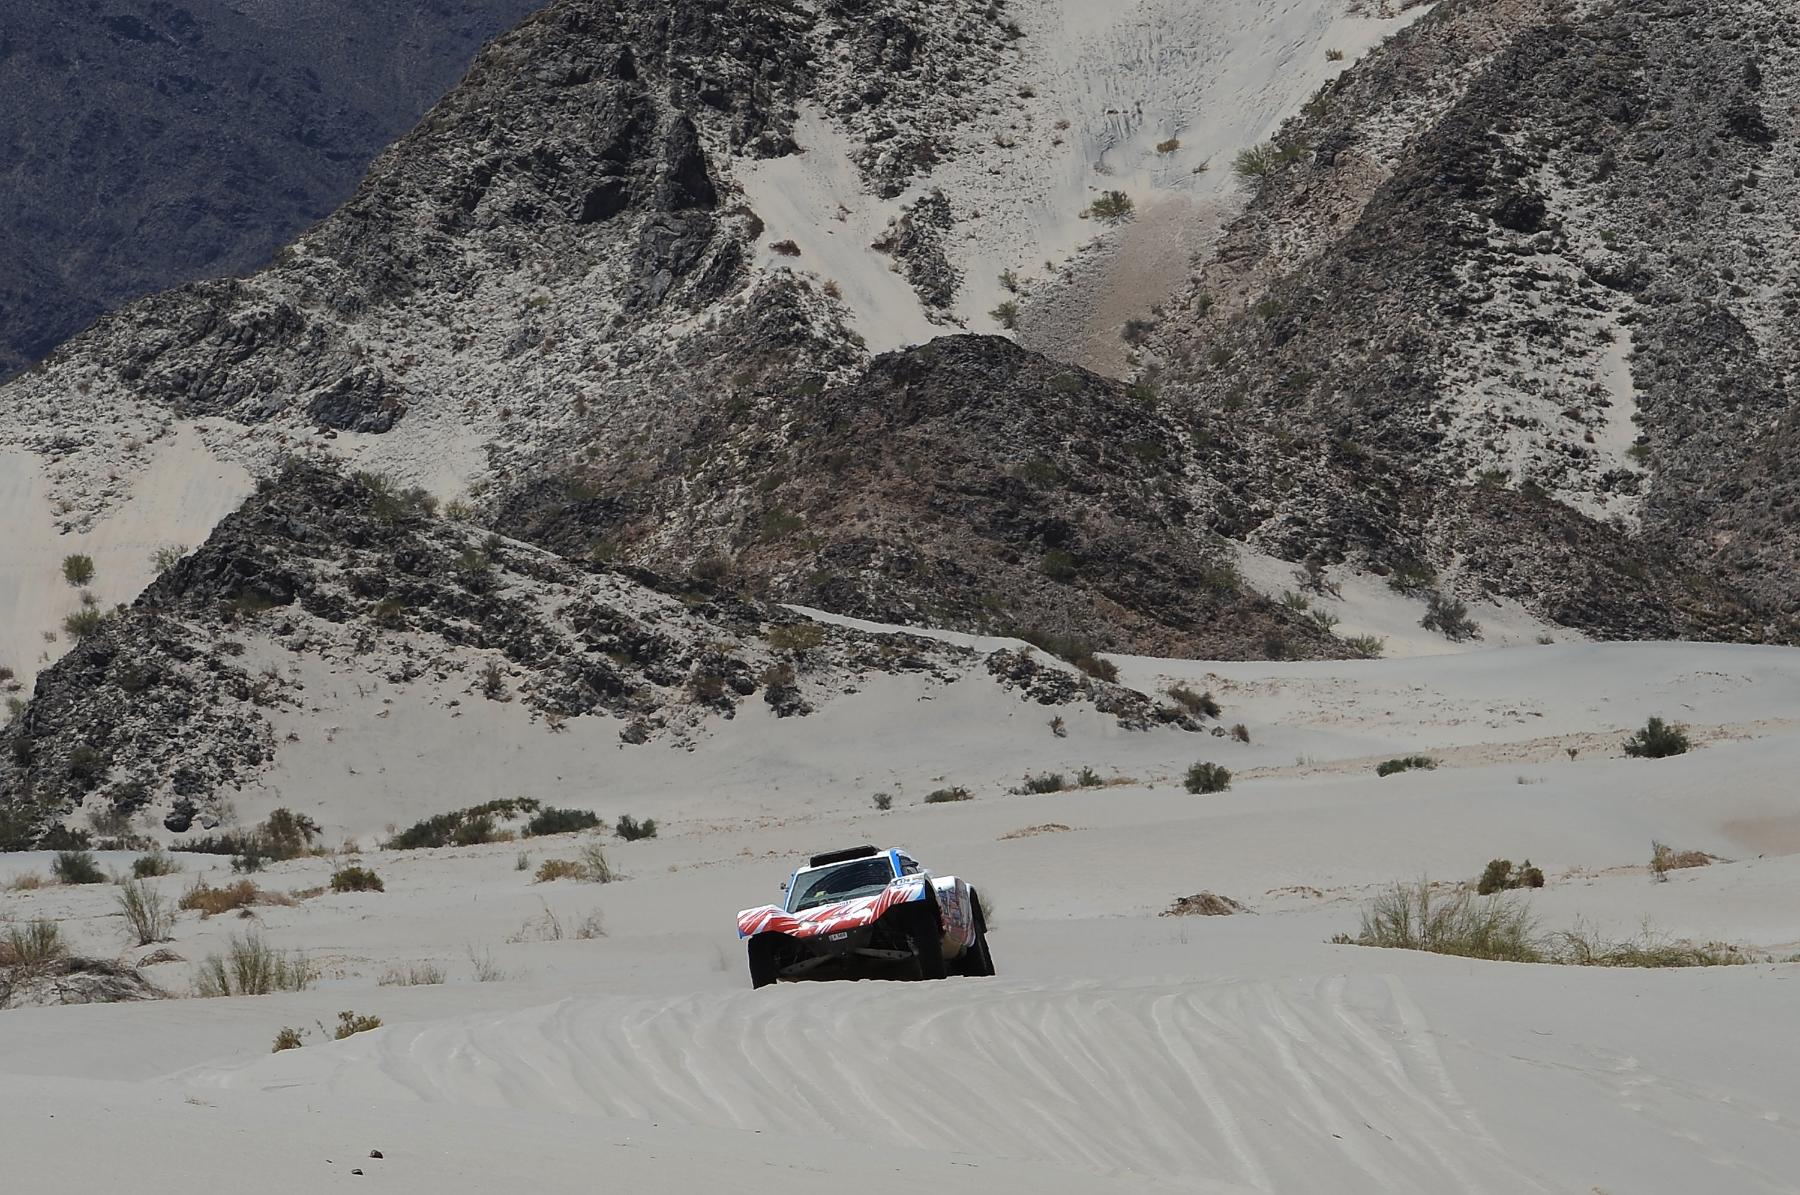 AUTO - DAKAR 2011 RACE PART 2